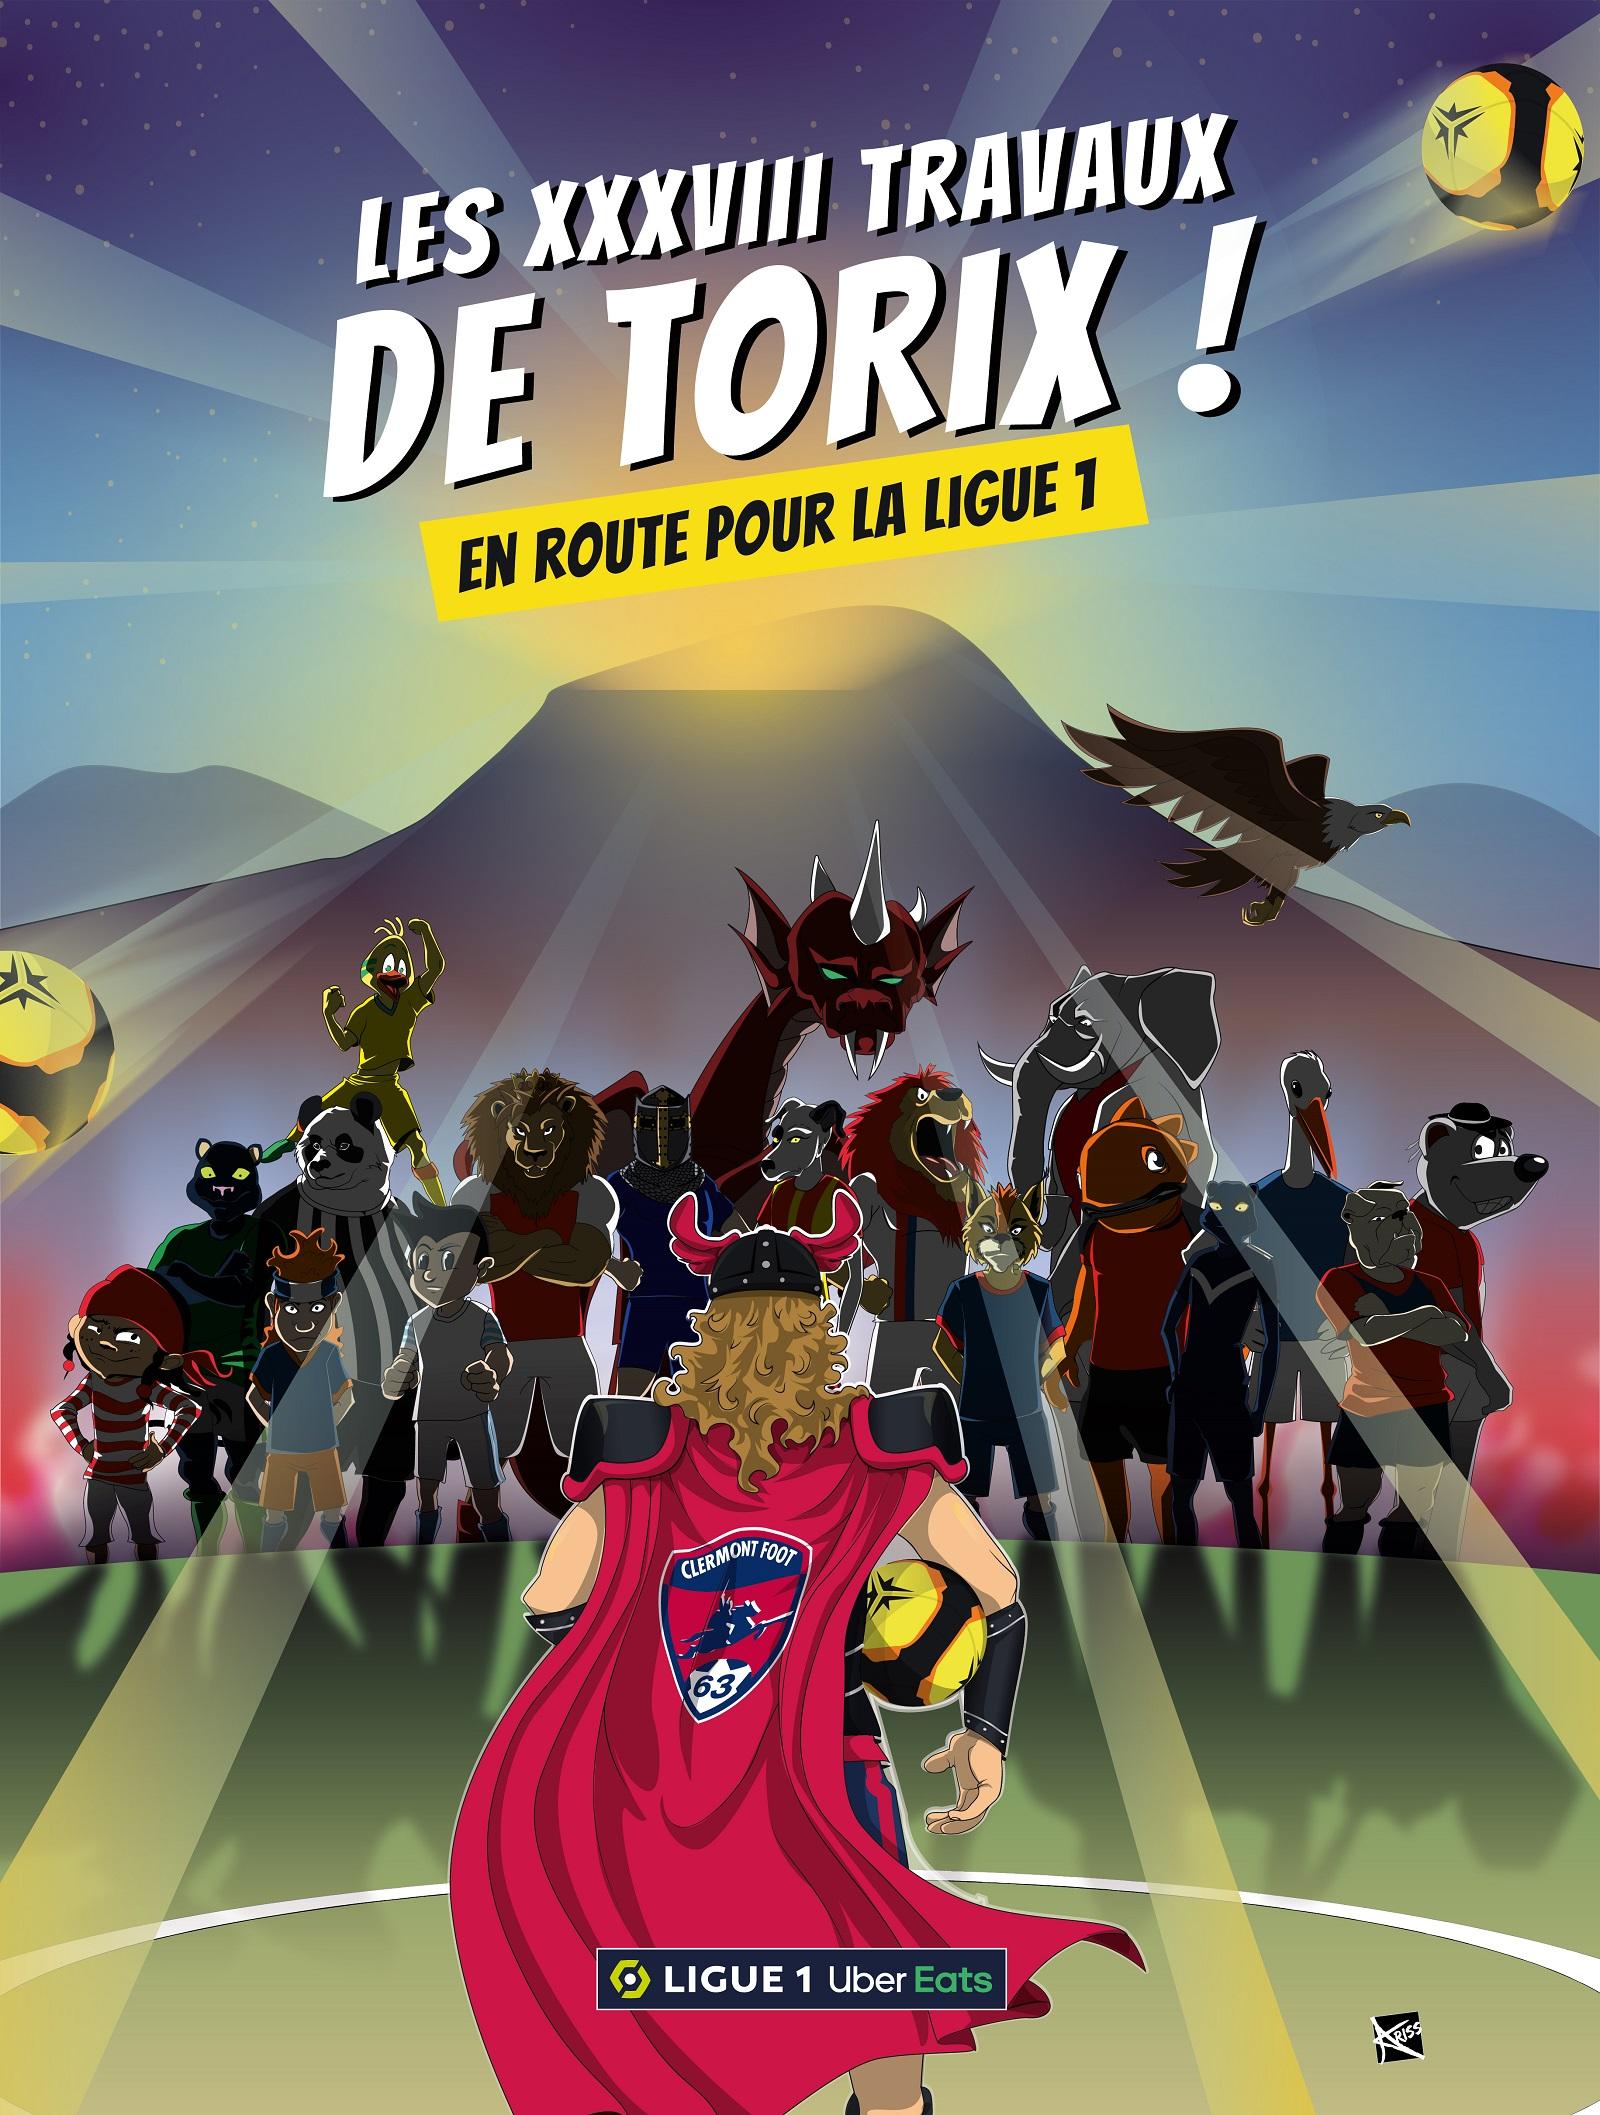 Torix_38travaux_Ligue1_compress.jpg